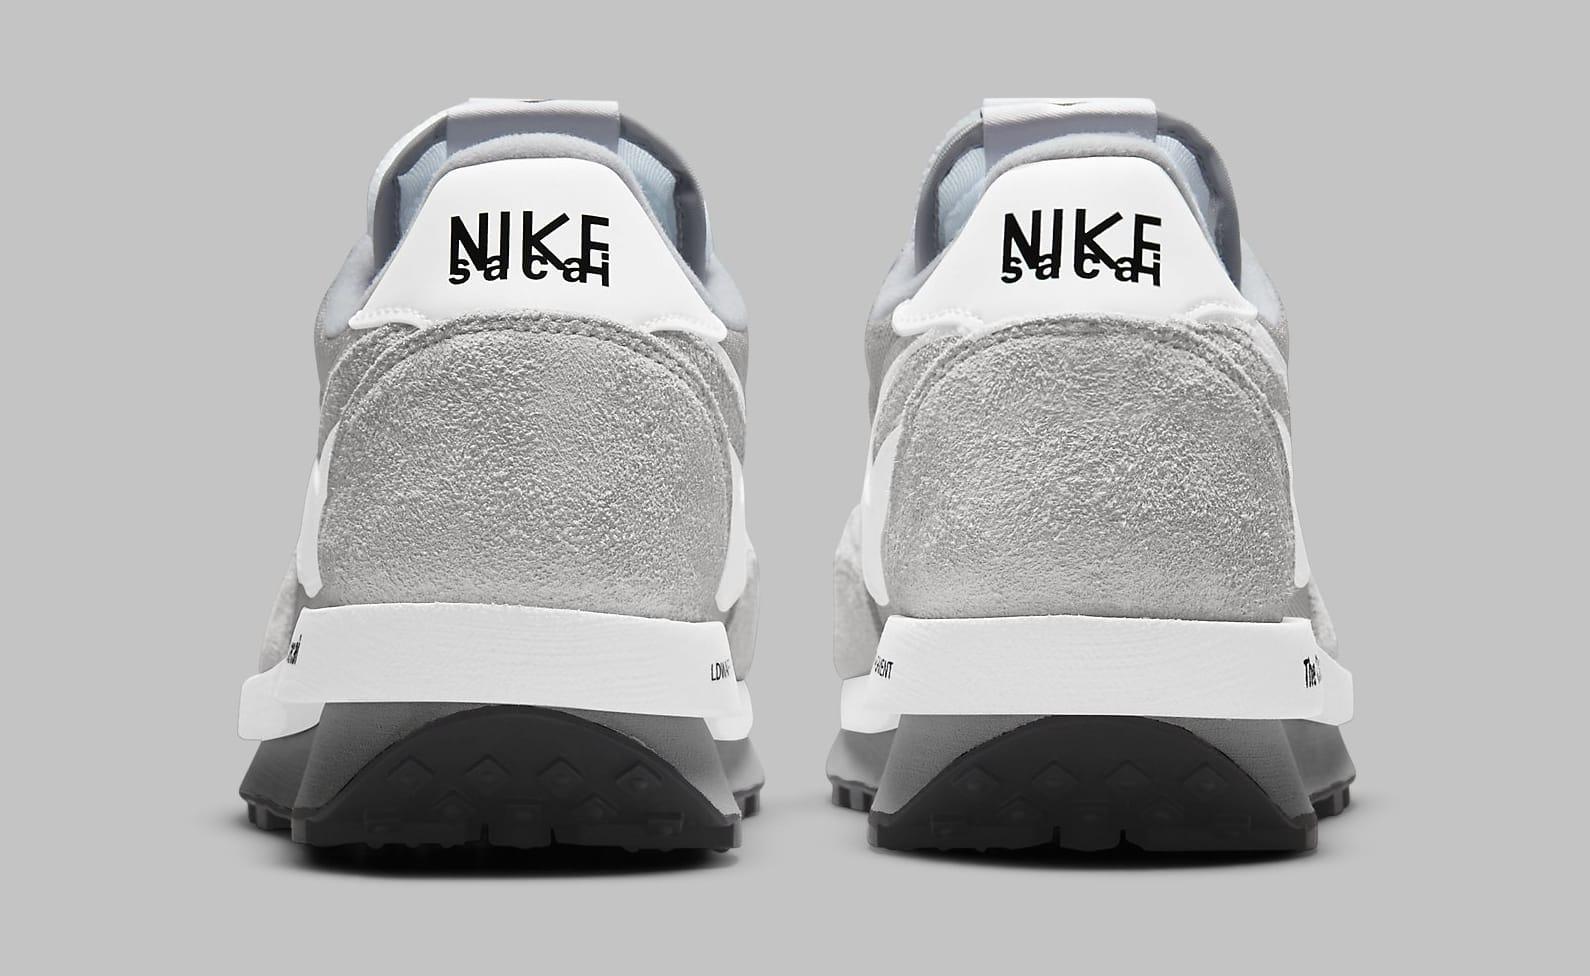 Fragment x Sacai x Nike LDWaffle 'Light Smoke Grey' DH2684-001 Heel